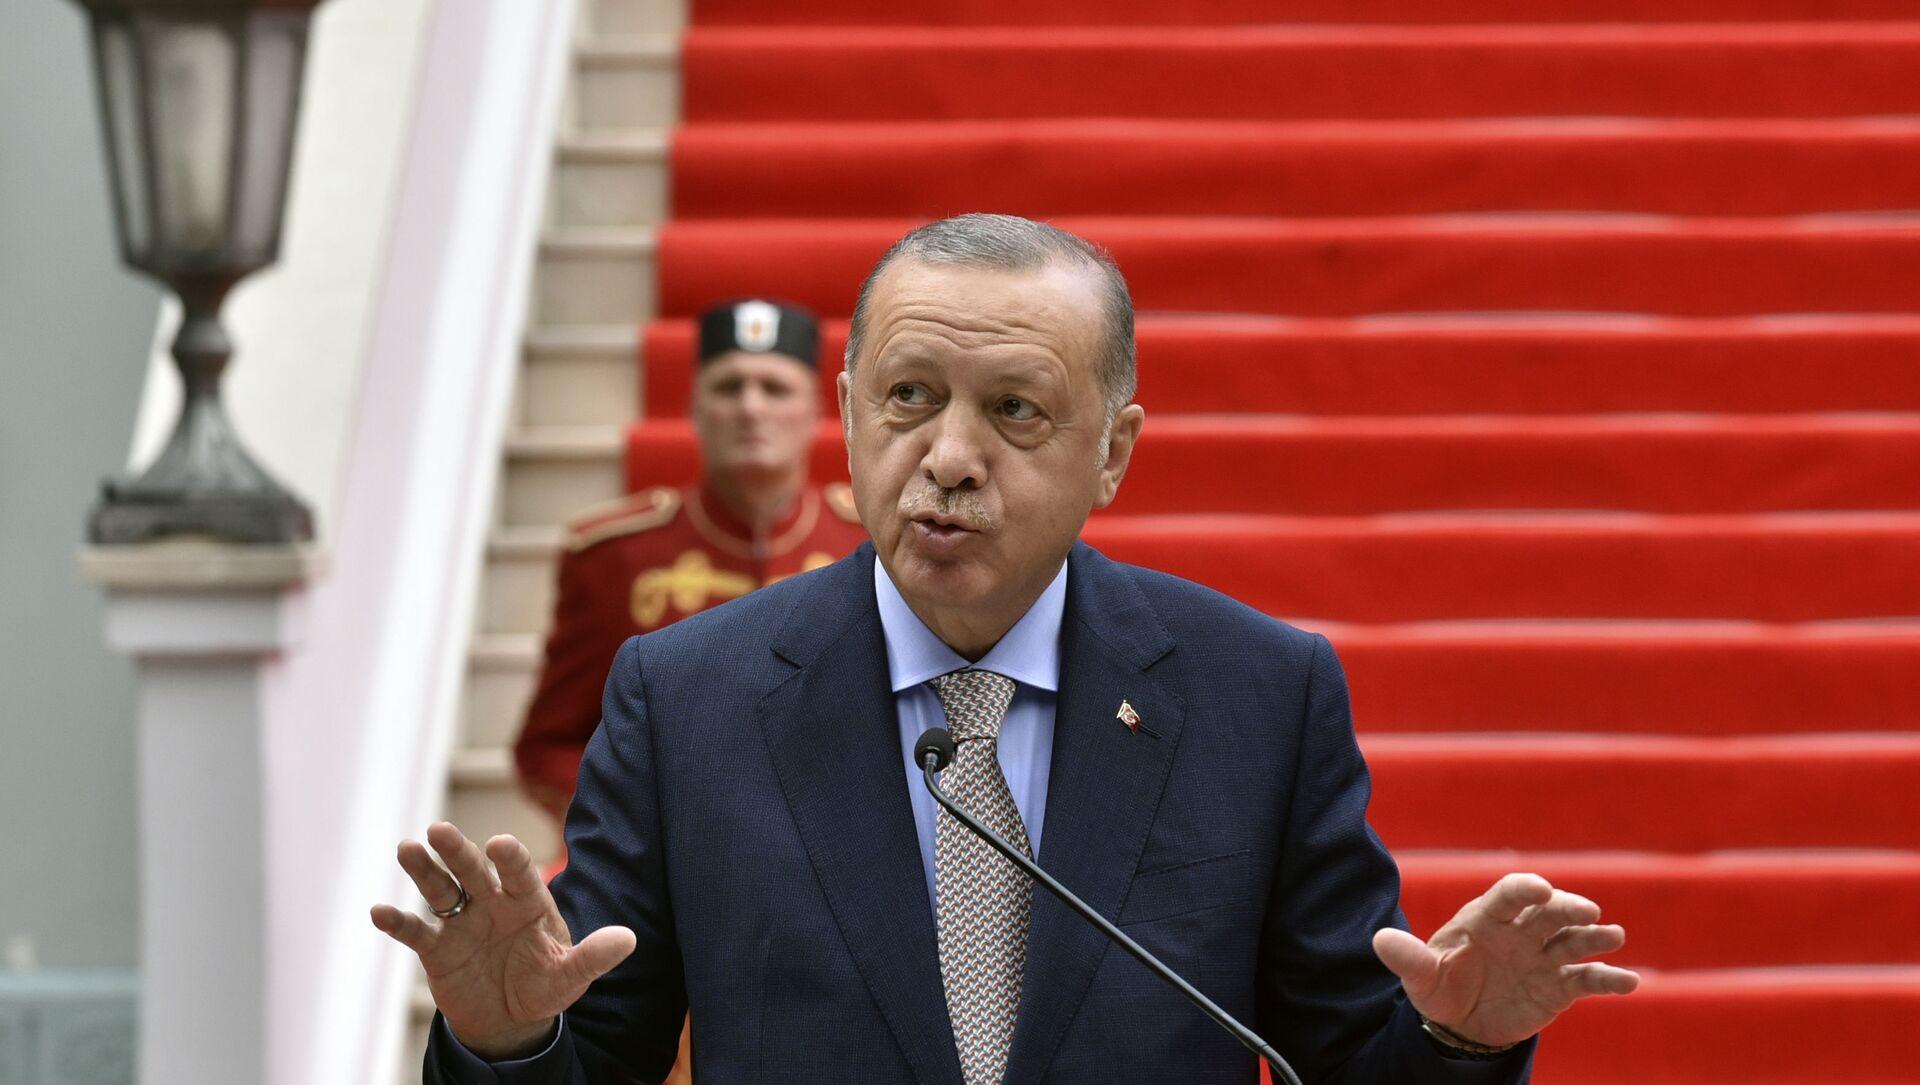 Президент Турции Реджеп Тайип Эрдоган, фото из архива - Sputnik Azərbaycan, 1920, 21.09.2021